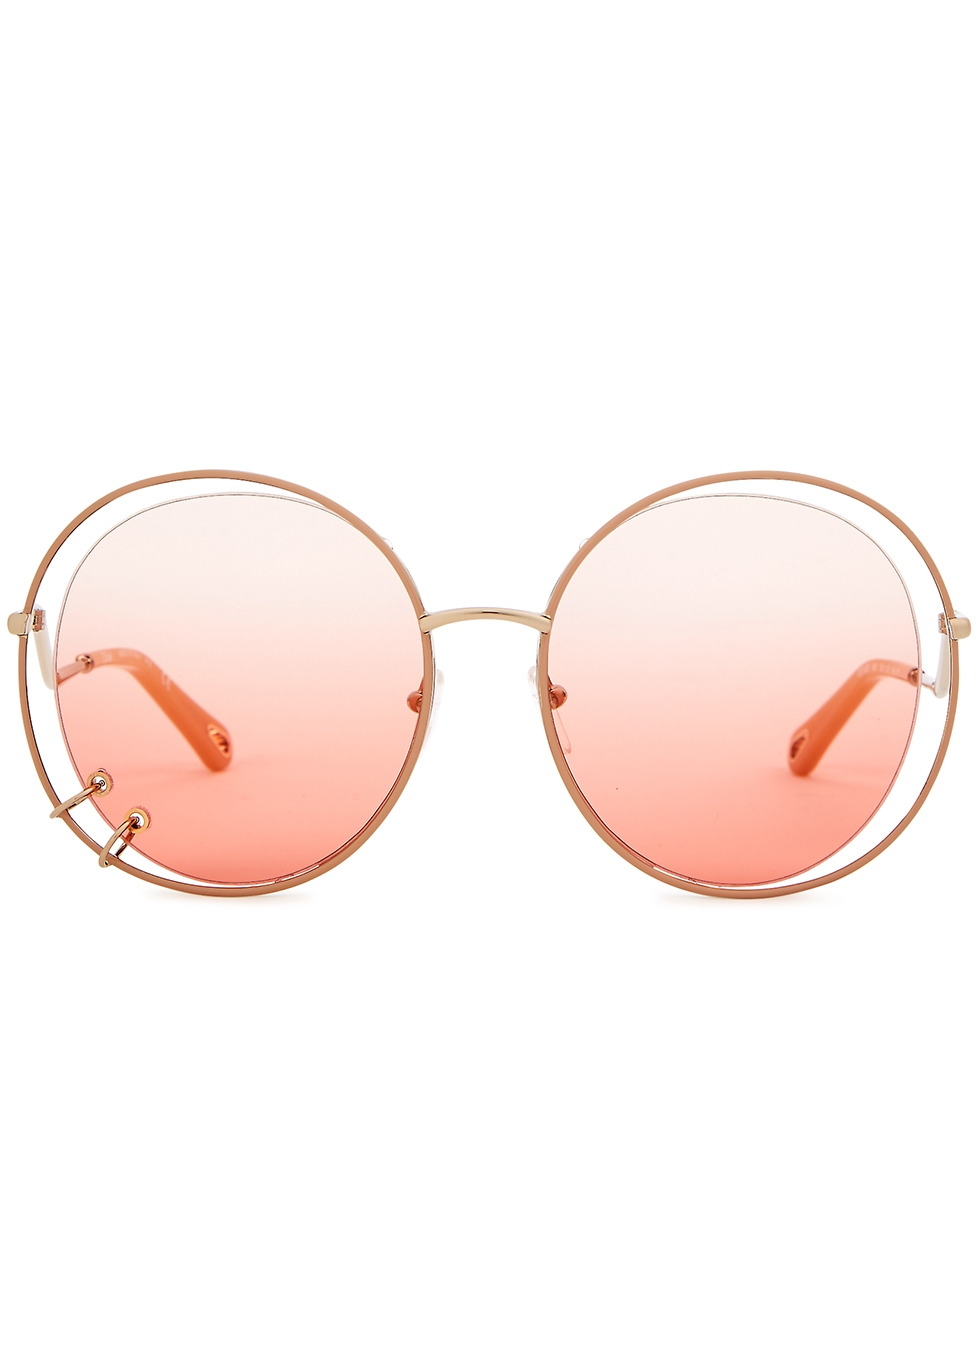 Gold-tone oversized sunglasses - Chloé